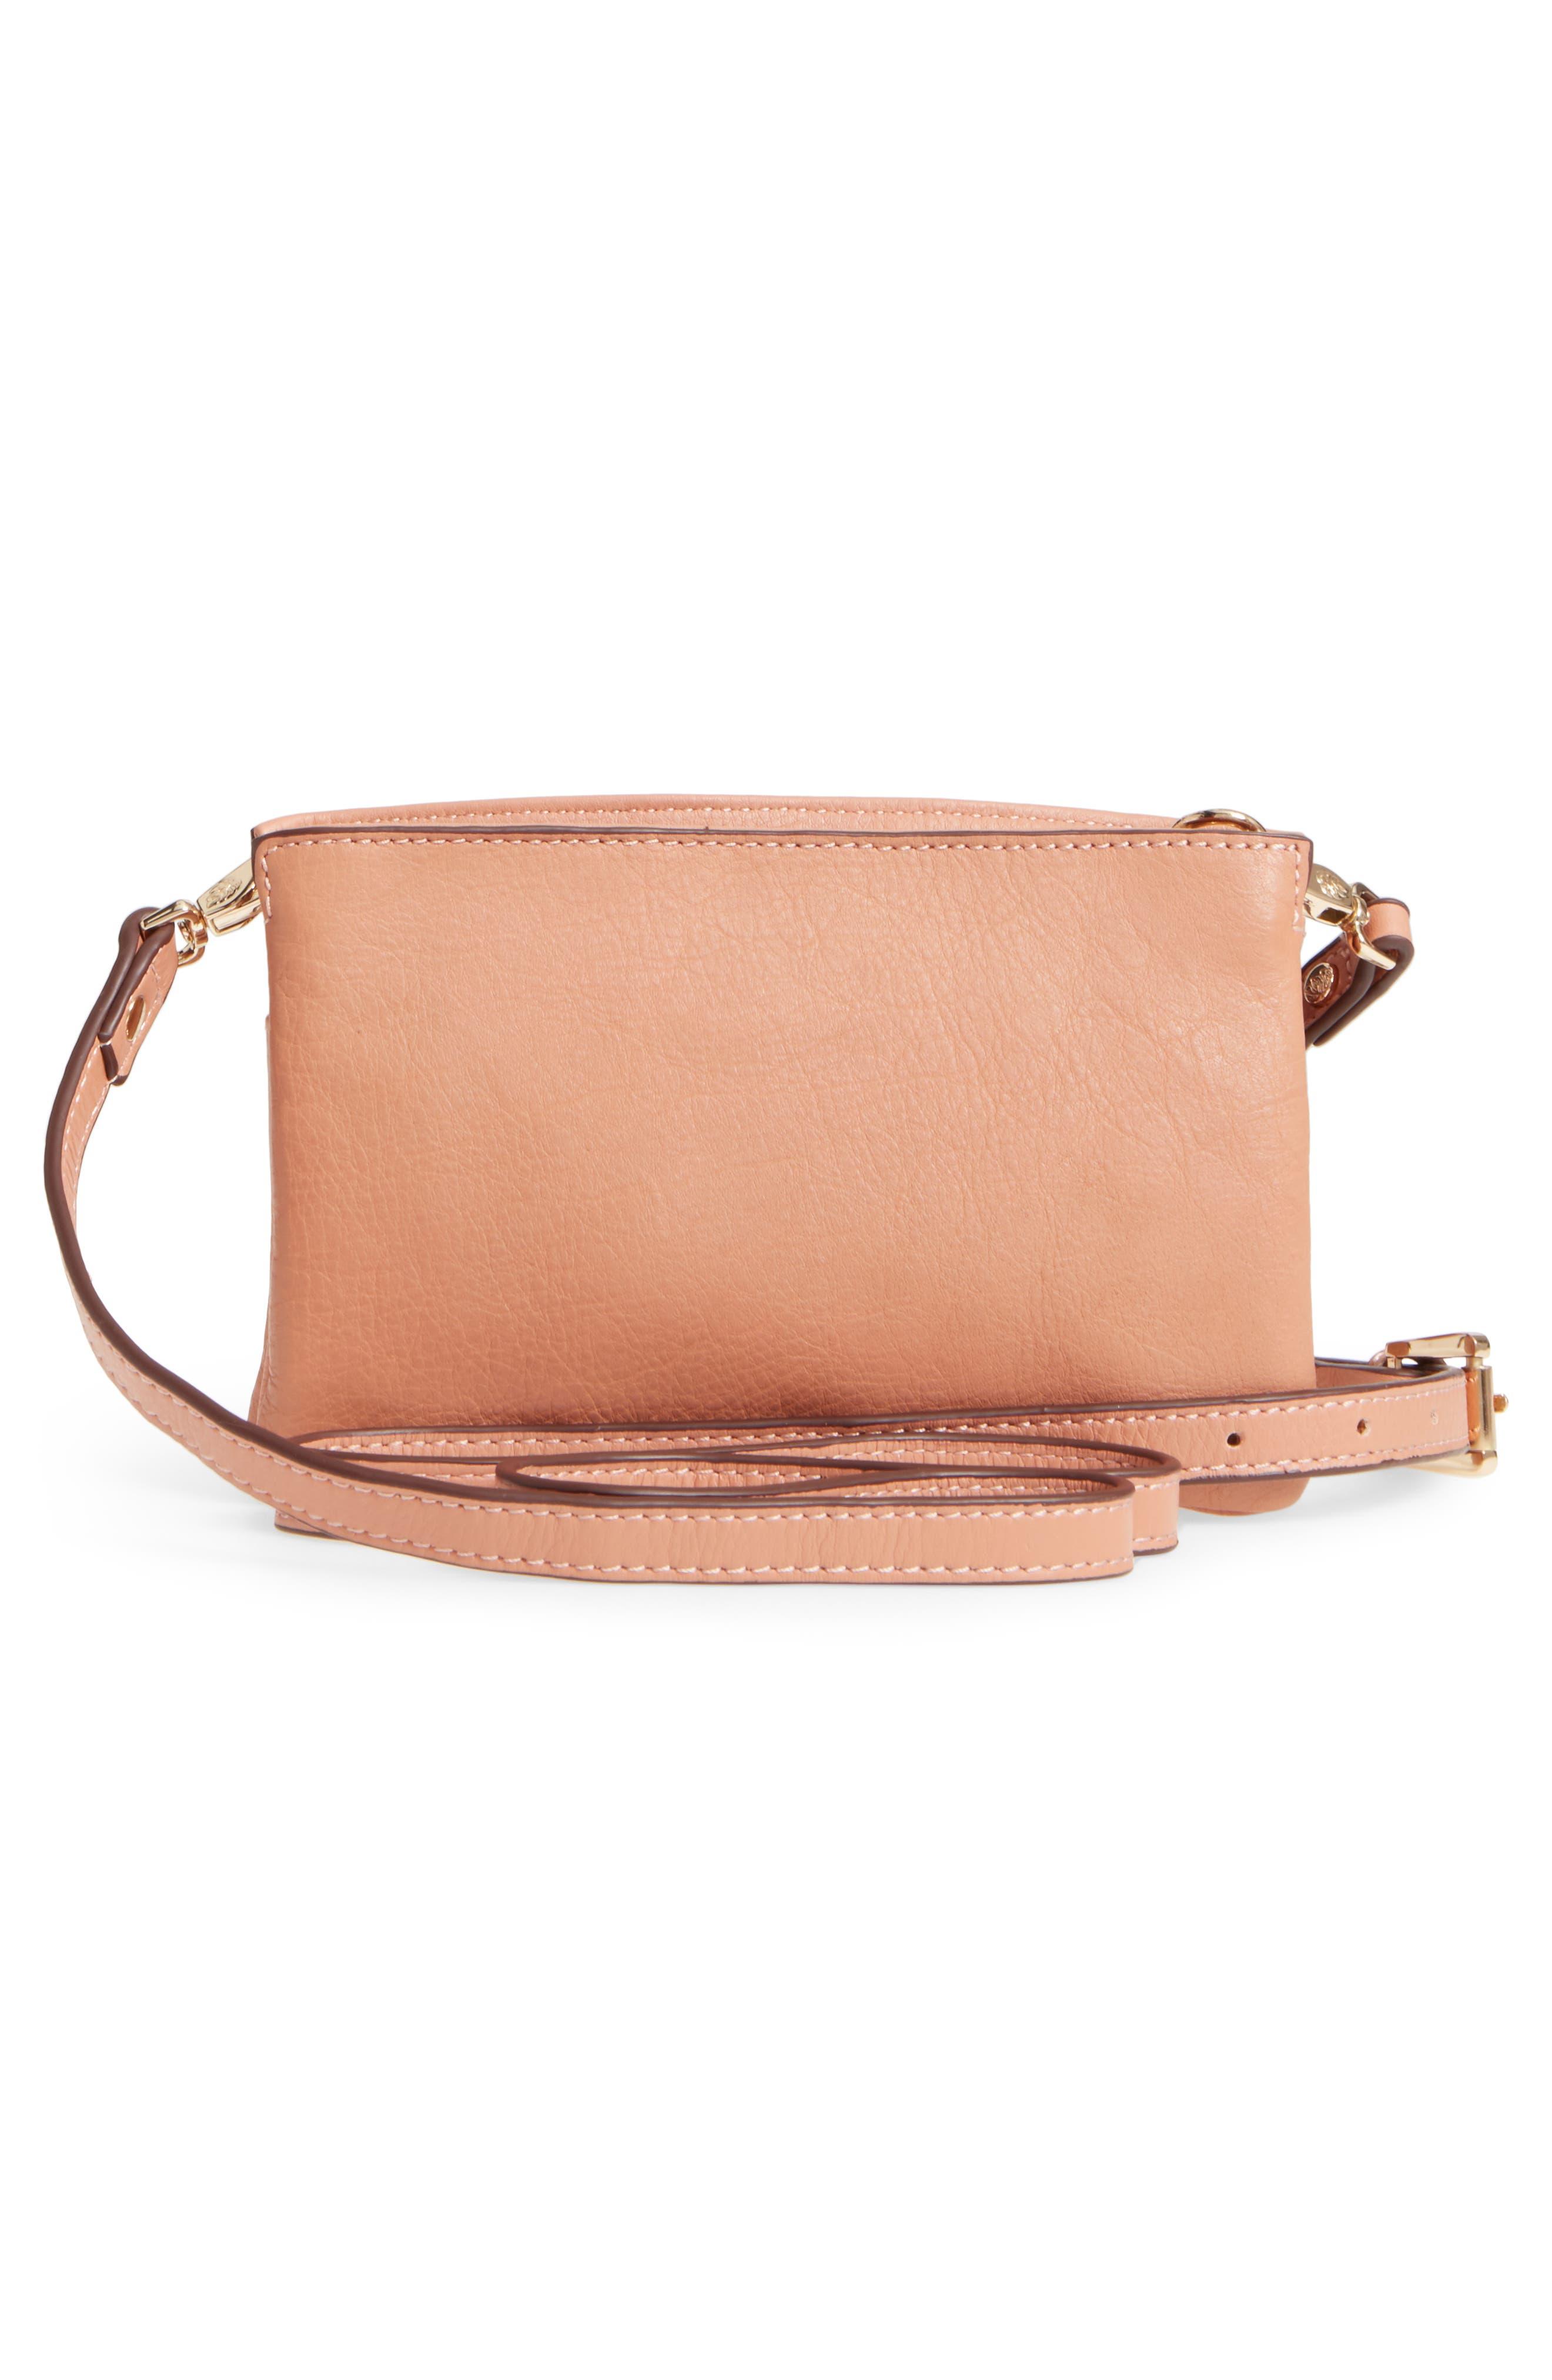 Katerini Leather Crossbody Wallet,                             Alternate thumbnail 13, color,